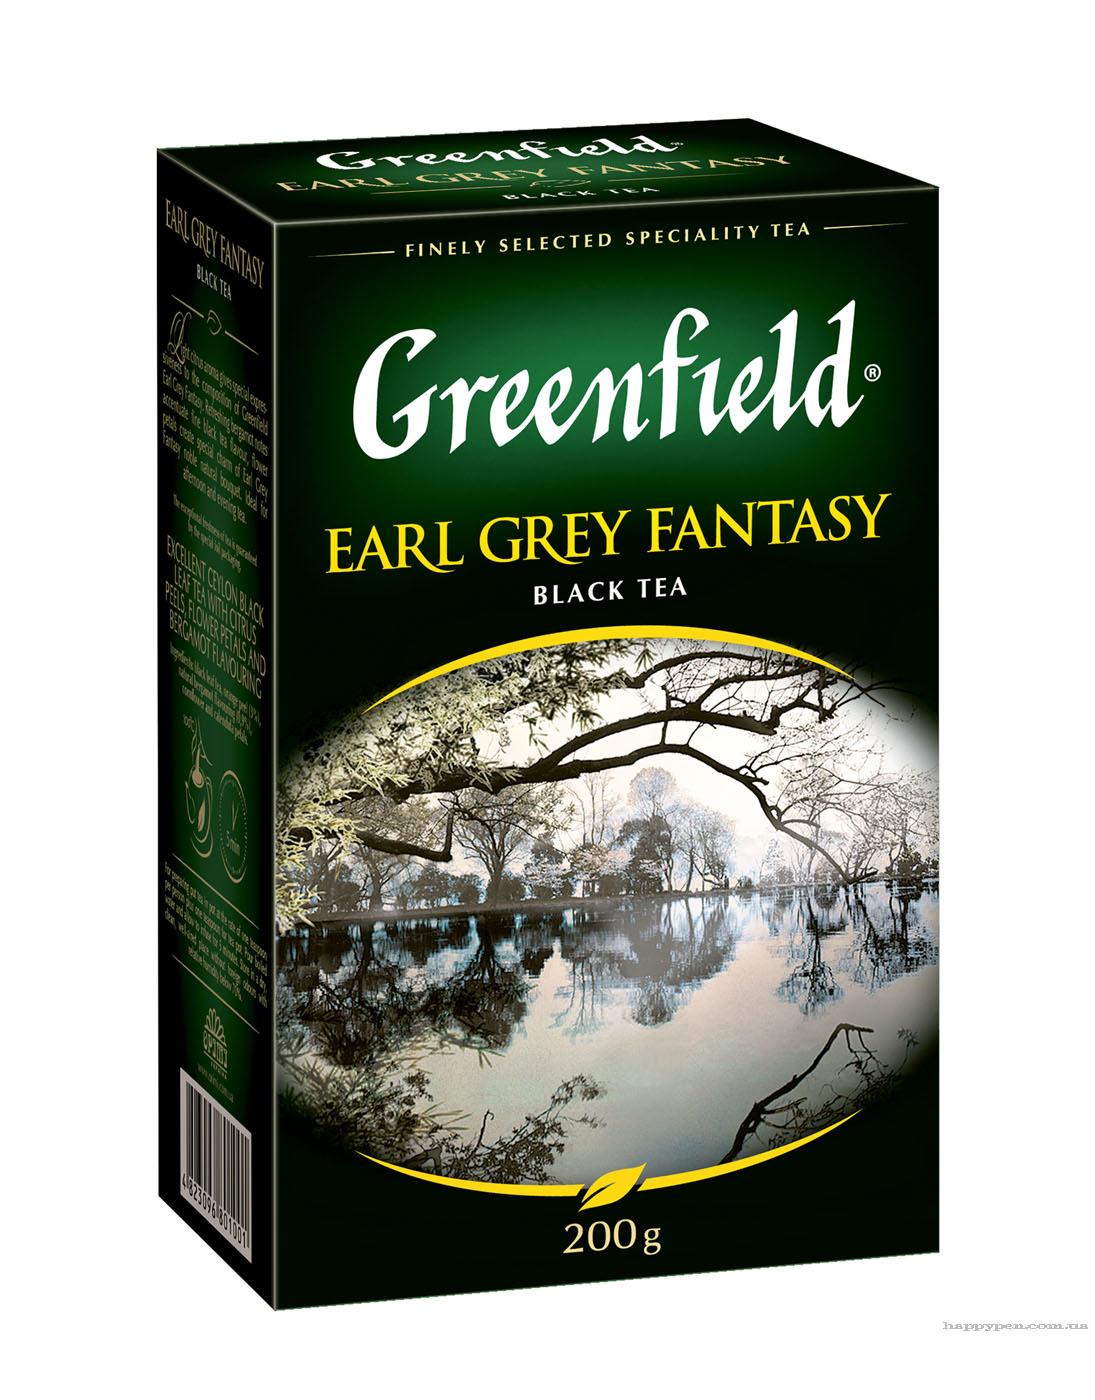 Чай черный ароматизированный Earl Grey Fantasy 200гр. Greenfield - фото 1